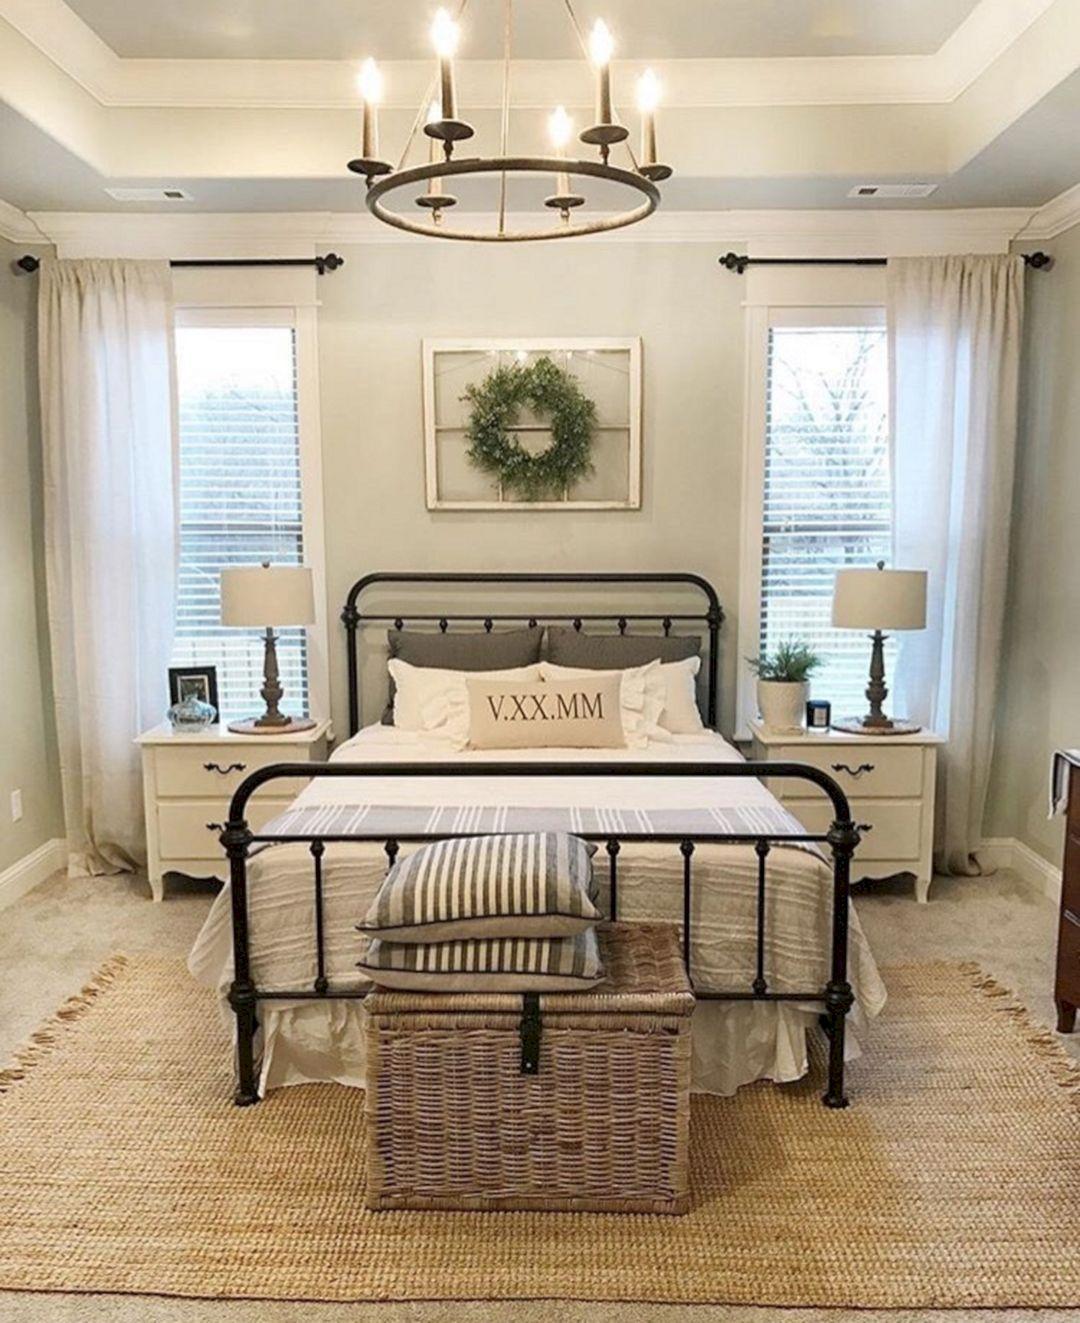 Phenomenal 45 Stunning Magnolia Homes Bedroom Design Ideas For Comfortable Sleep